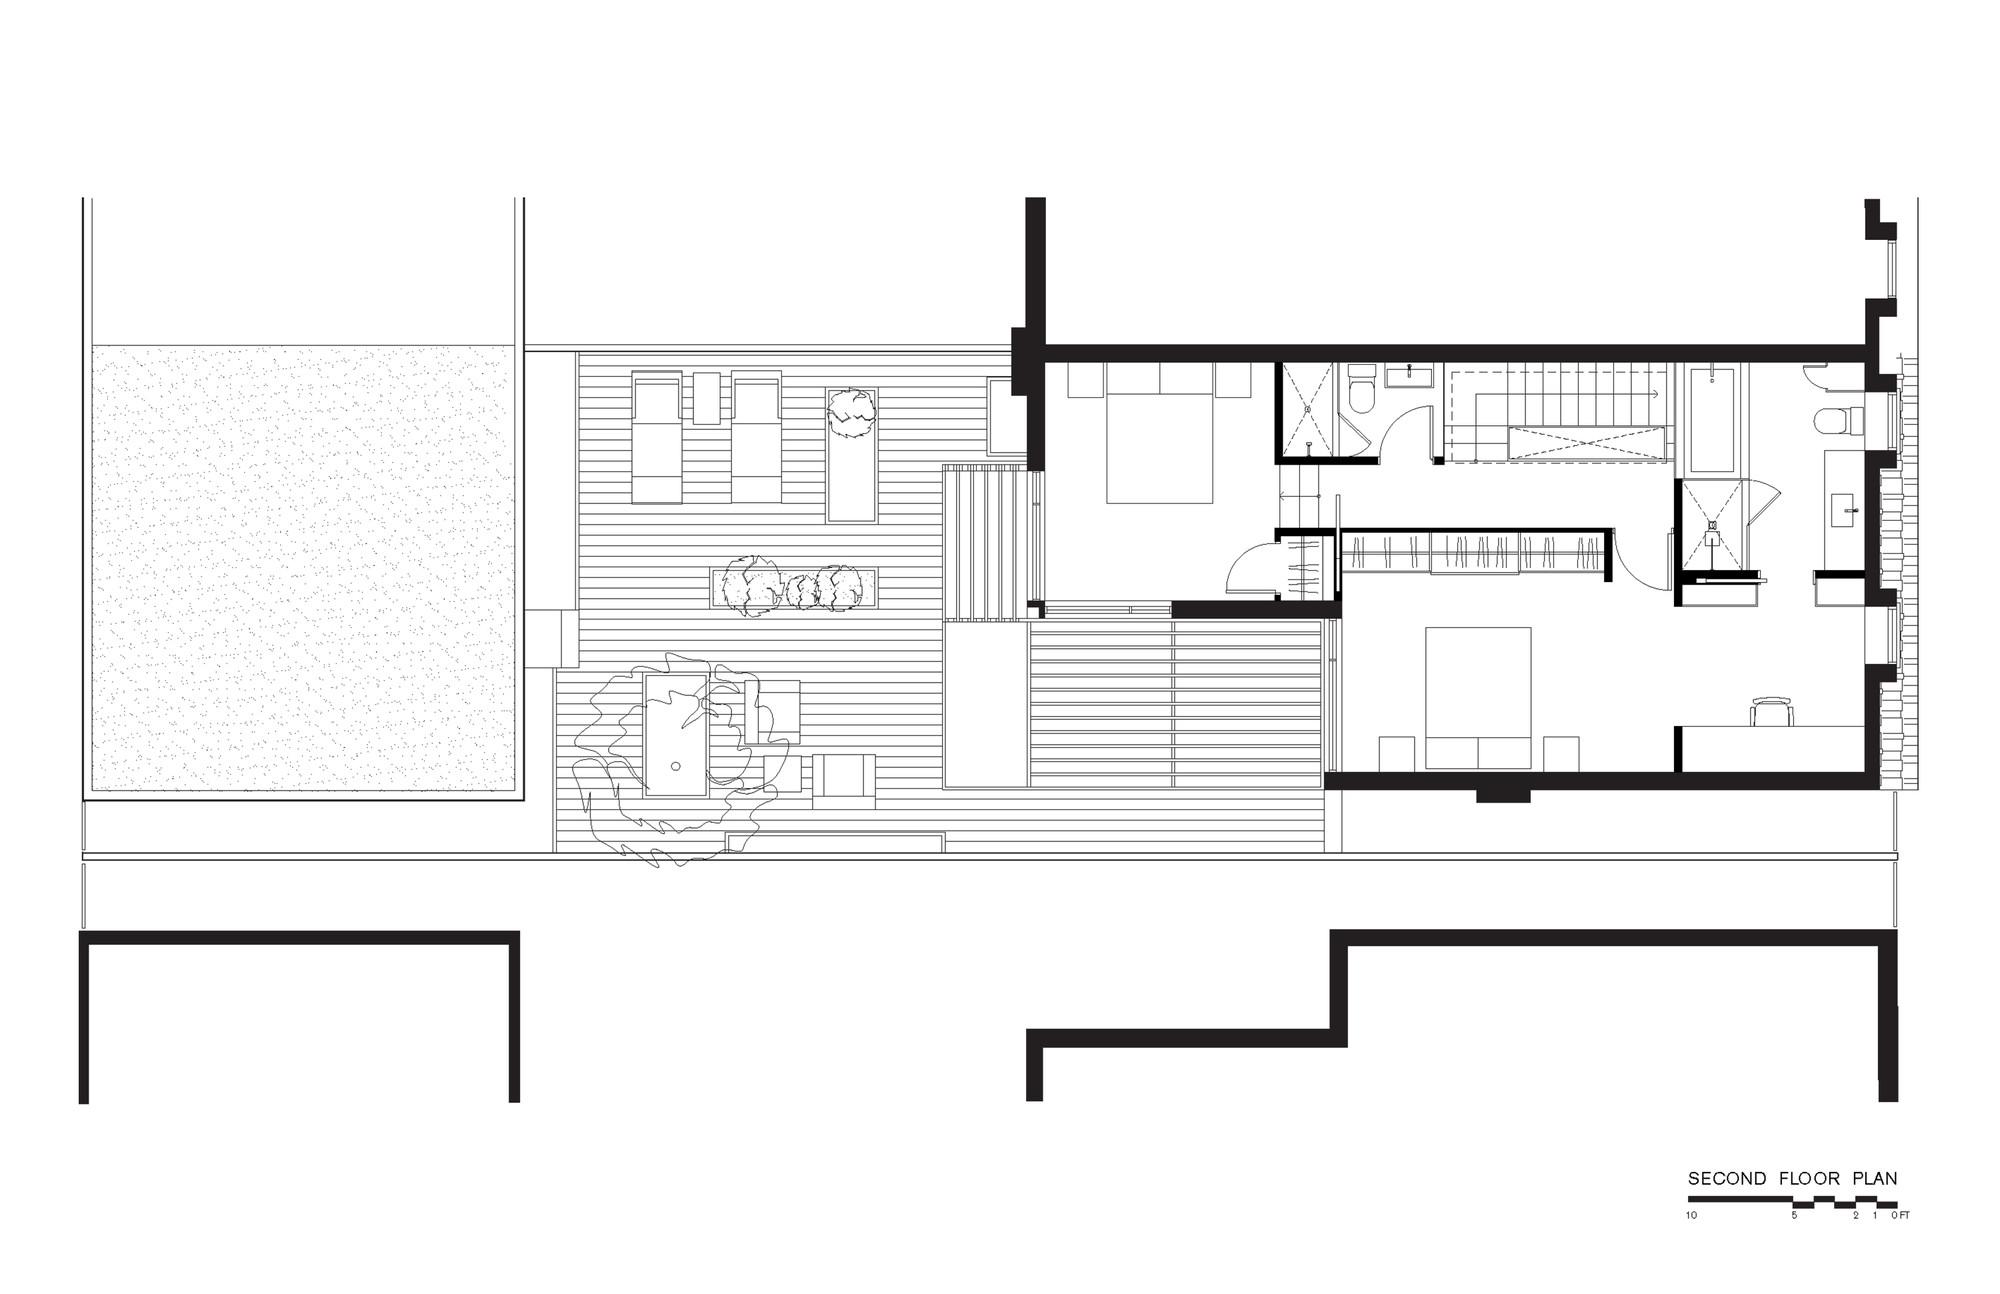 gallery of through house dubbeldam architecture design 14. Black Bedroom Furniture Sets. Home Design Ideas